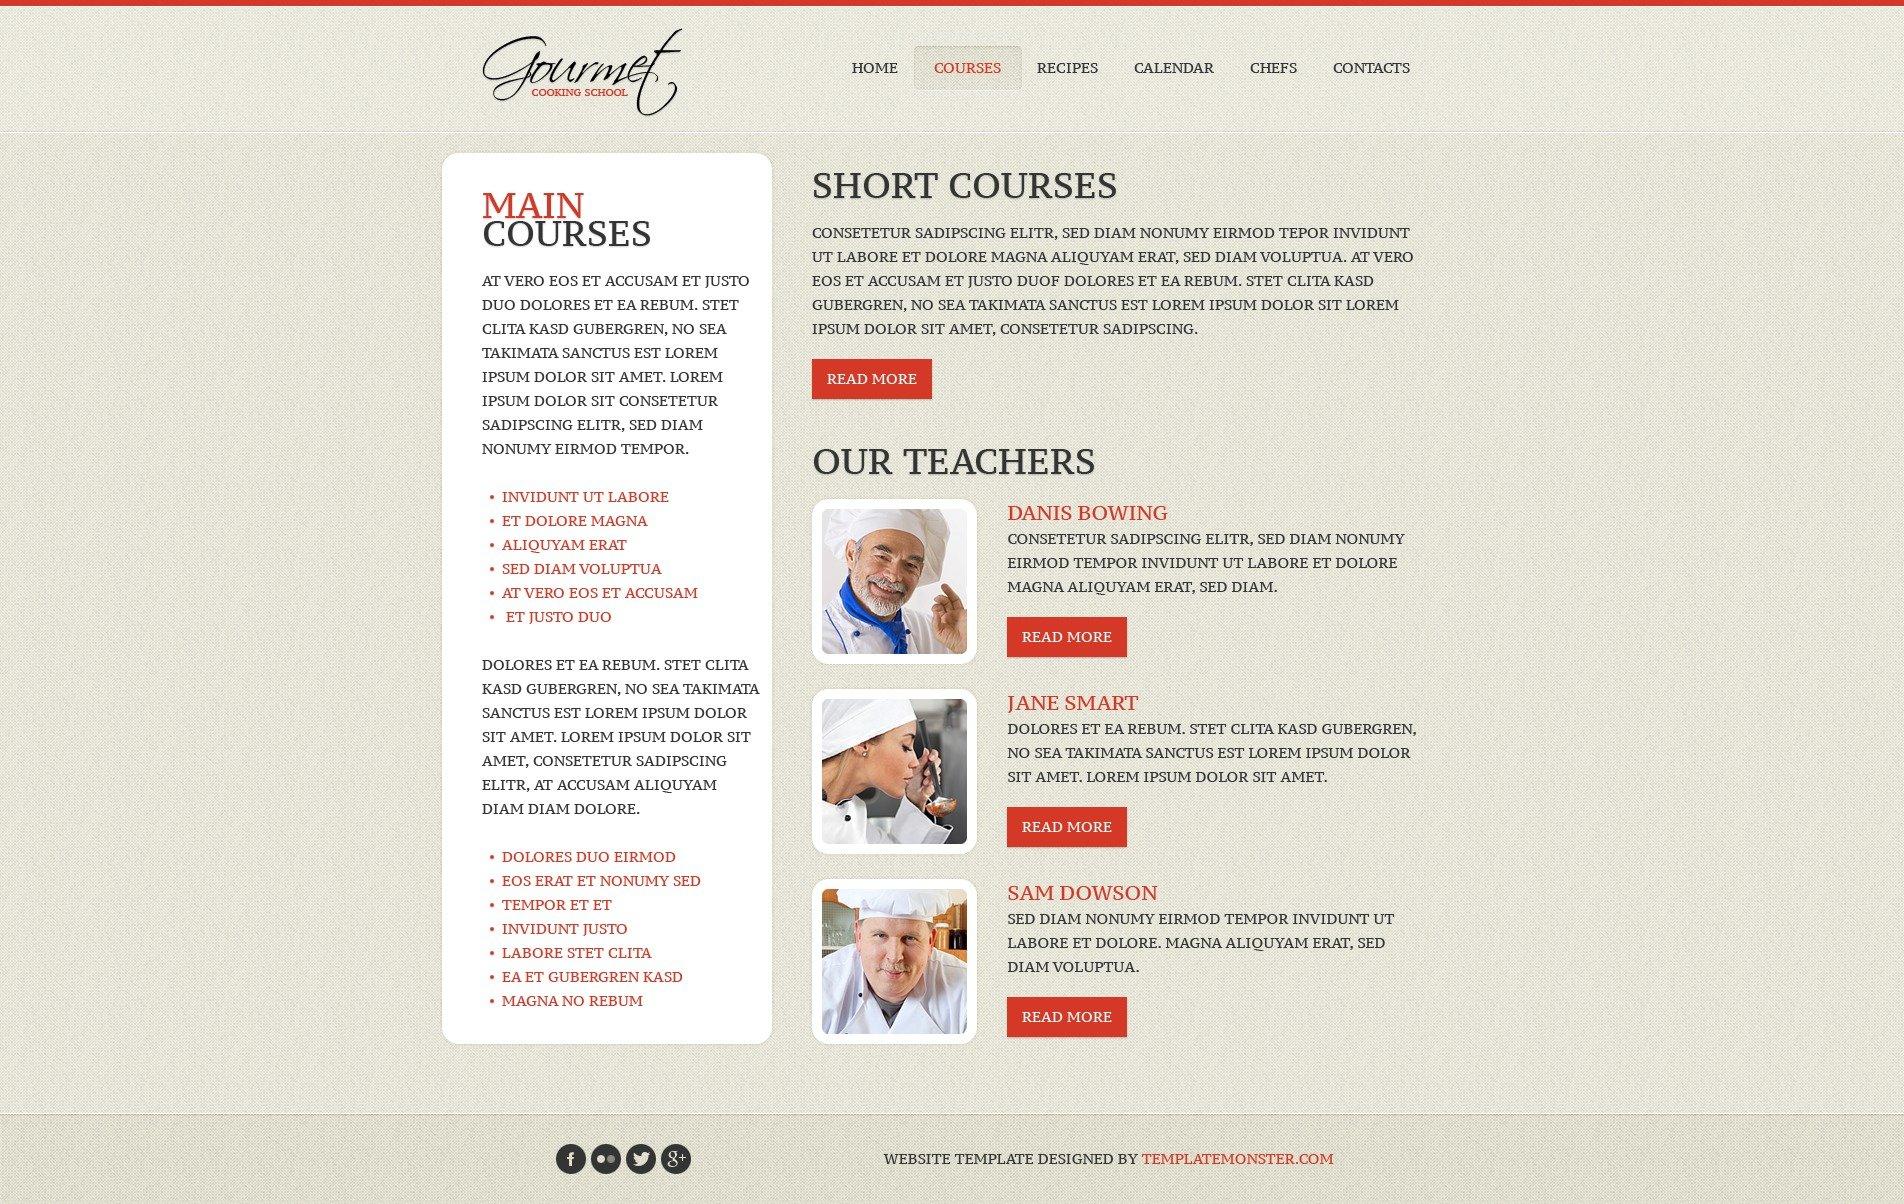 Free Website Template - Cooking Website Template